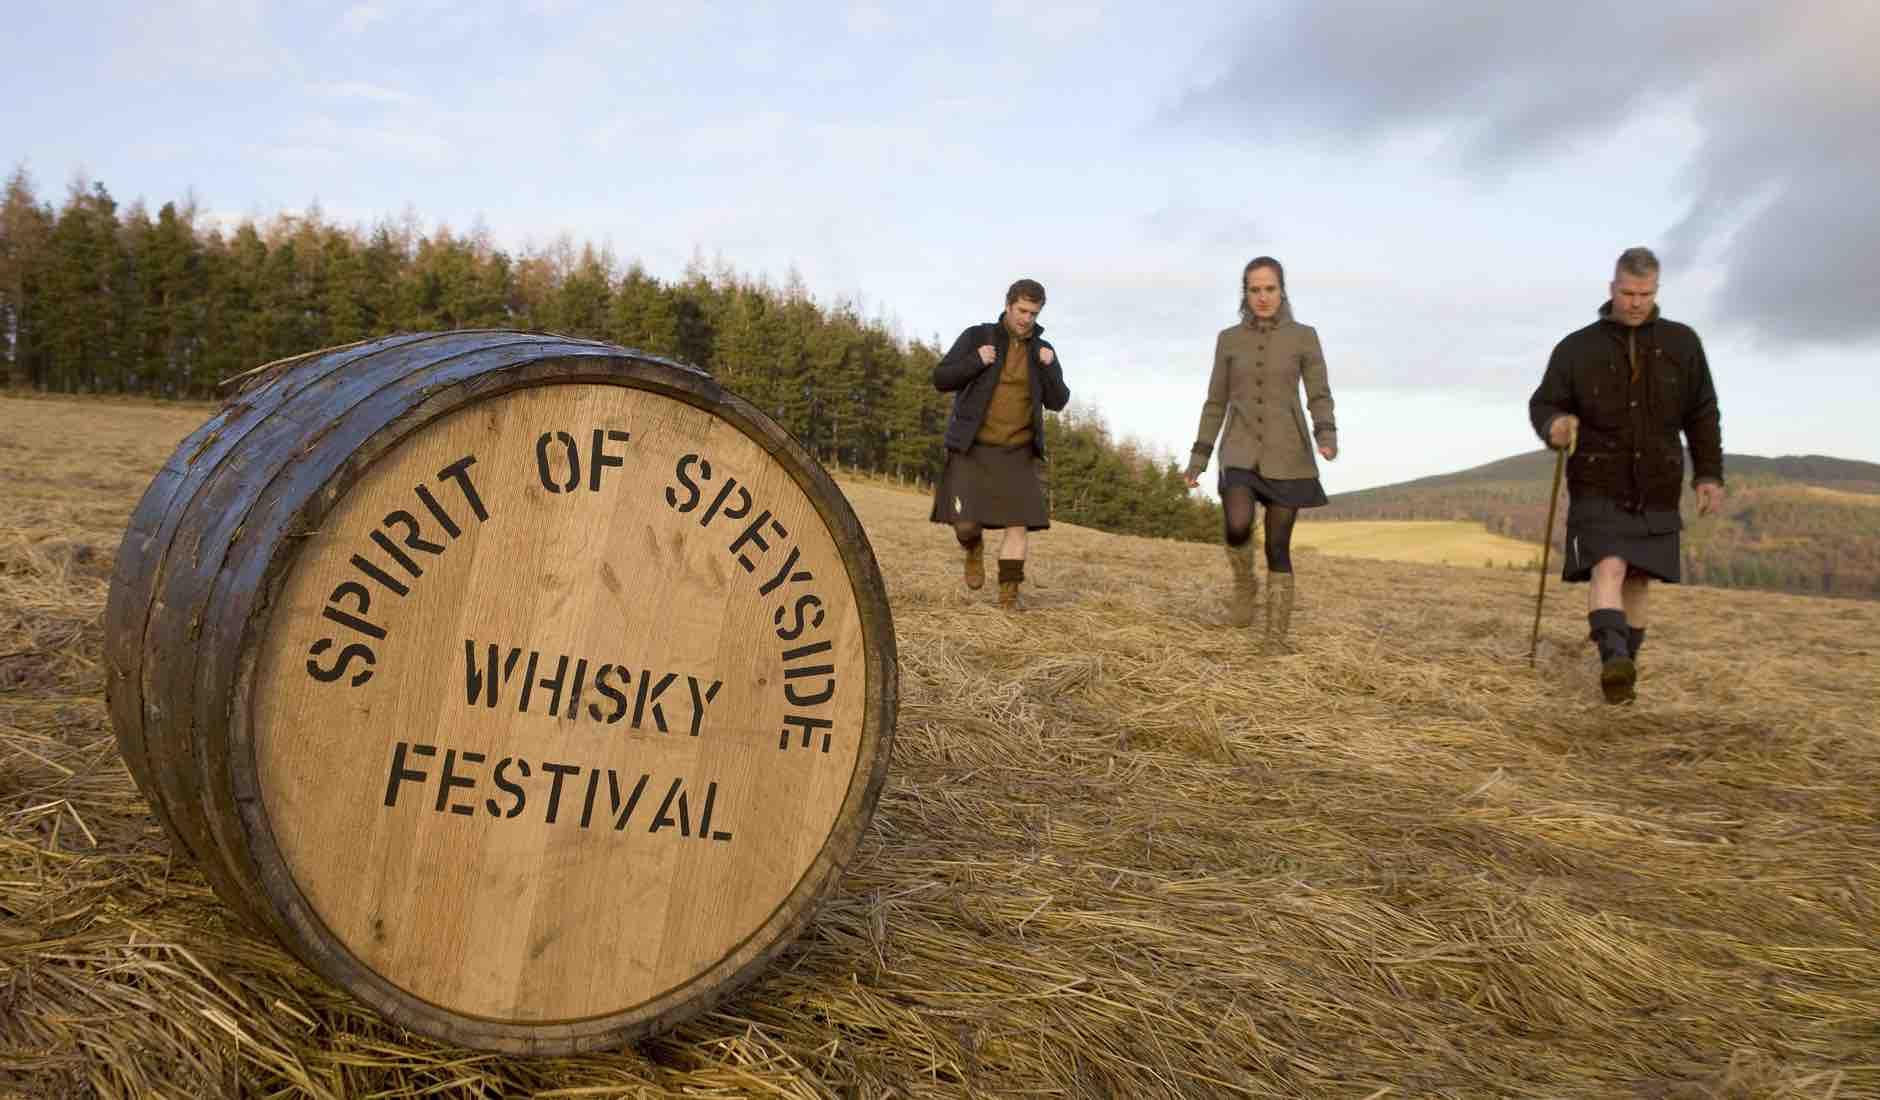 Whisky festival in Scotland